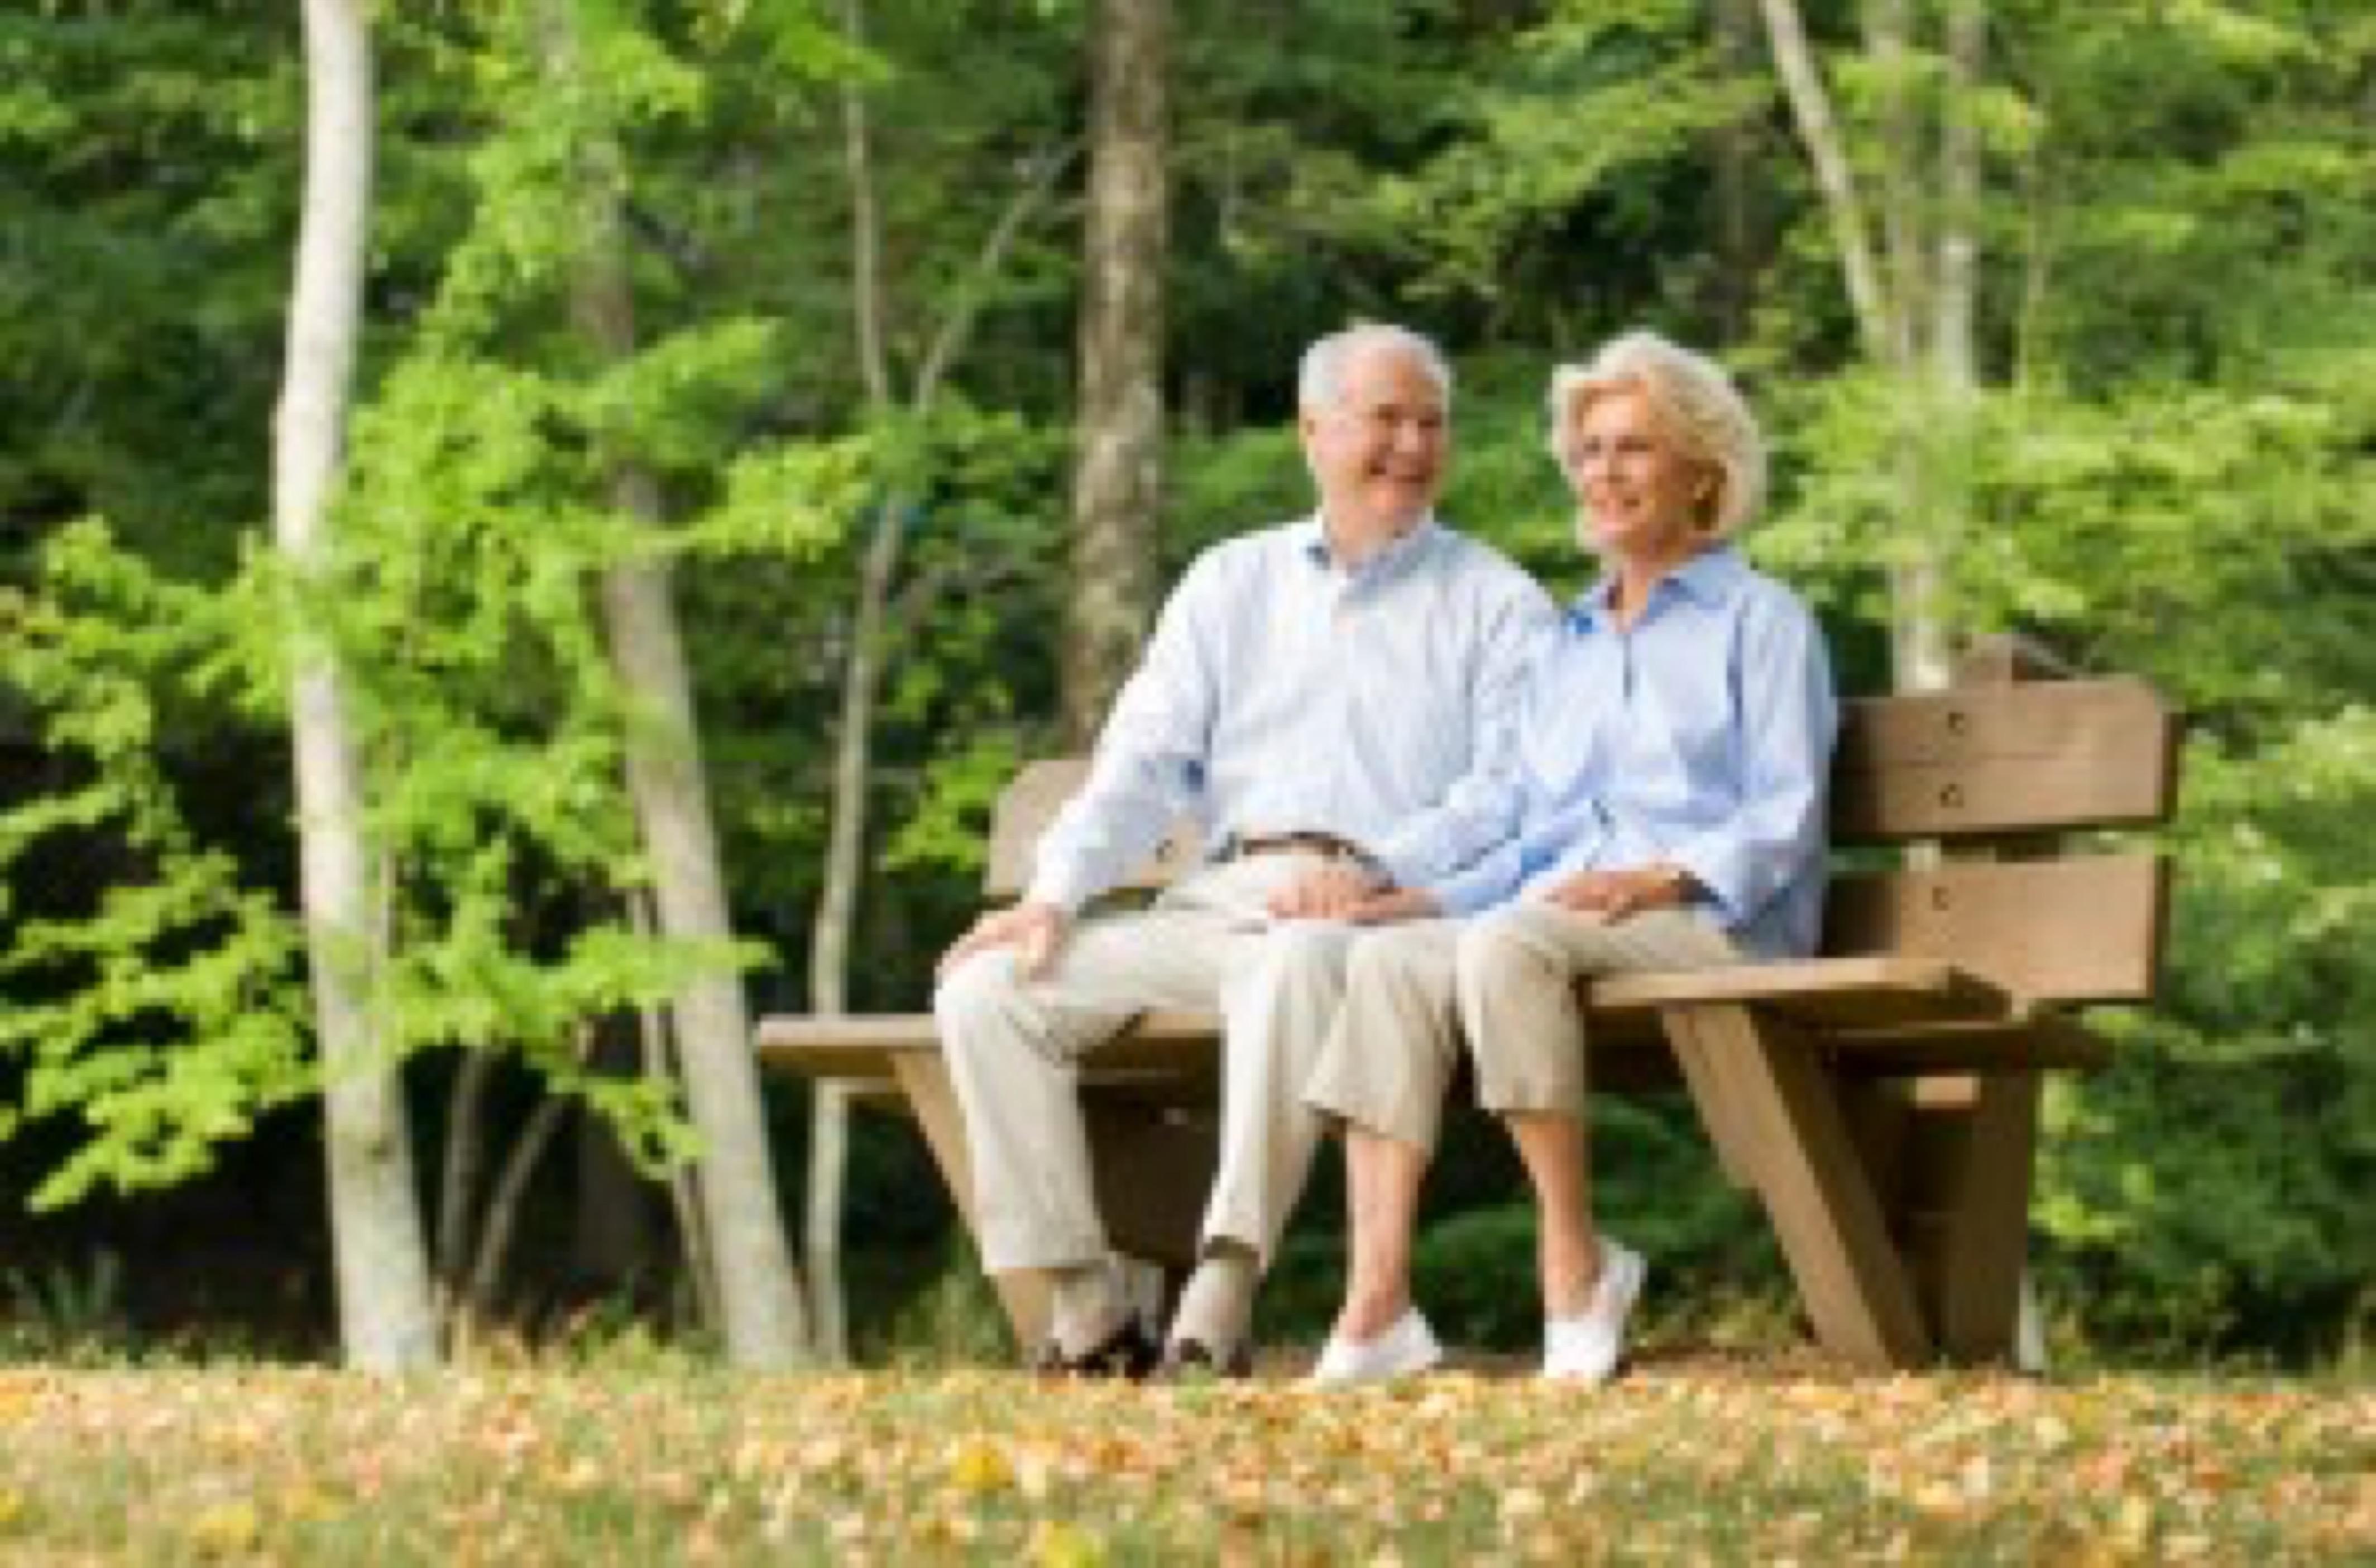 blog - older couple image